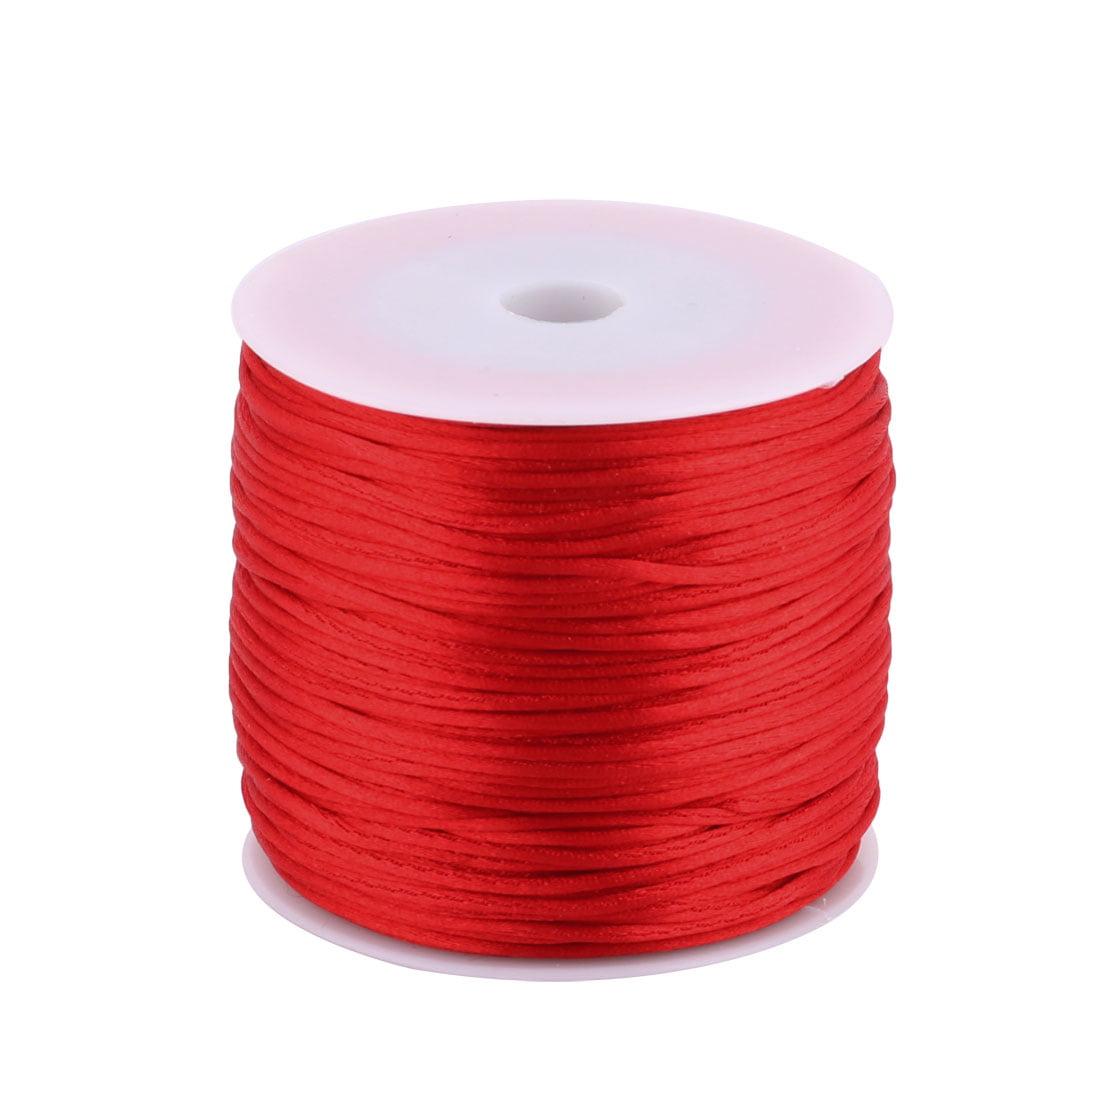 Nylon Handicraft DIY Knit Fan Flute Decor Pendant Cord Red 1.5mm Dia 78.7 Yards